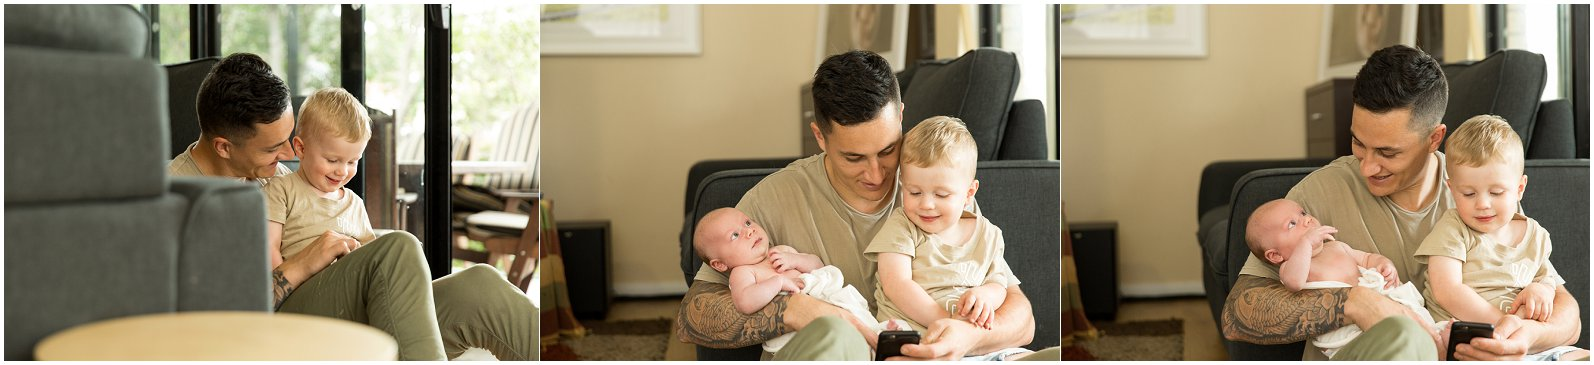 gold coast newborn photographer baby photos jade read photography_0015.jpg